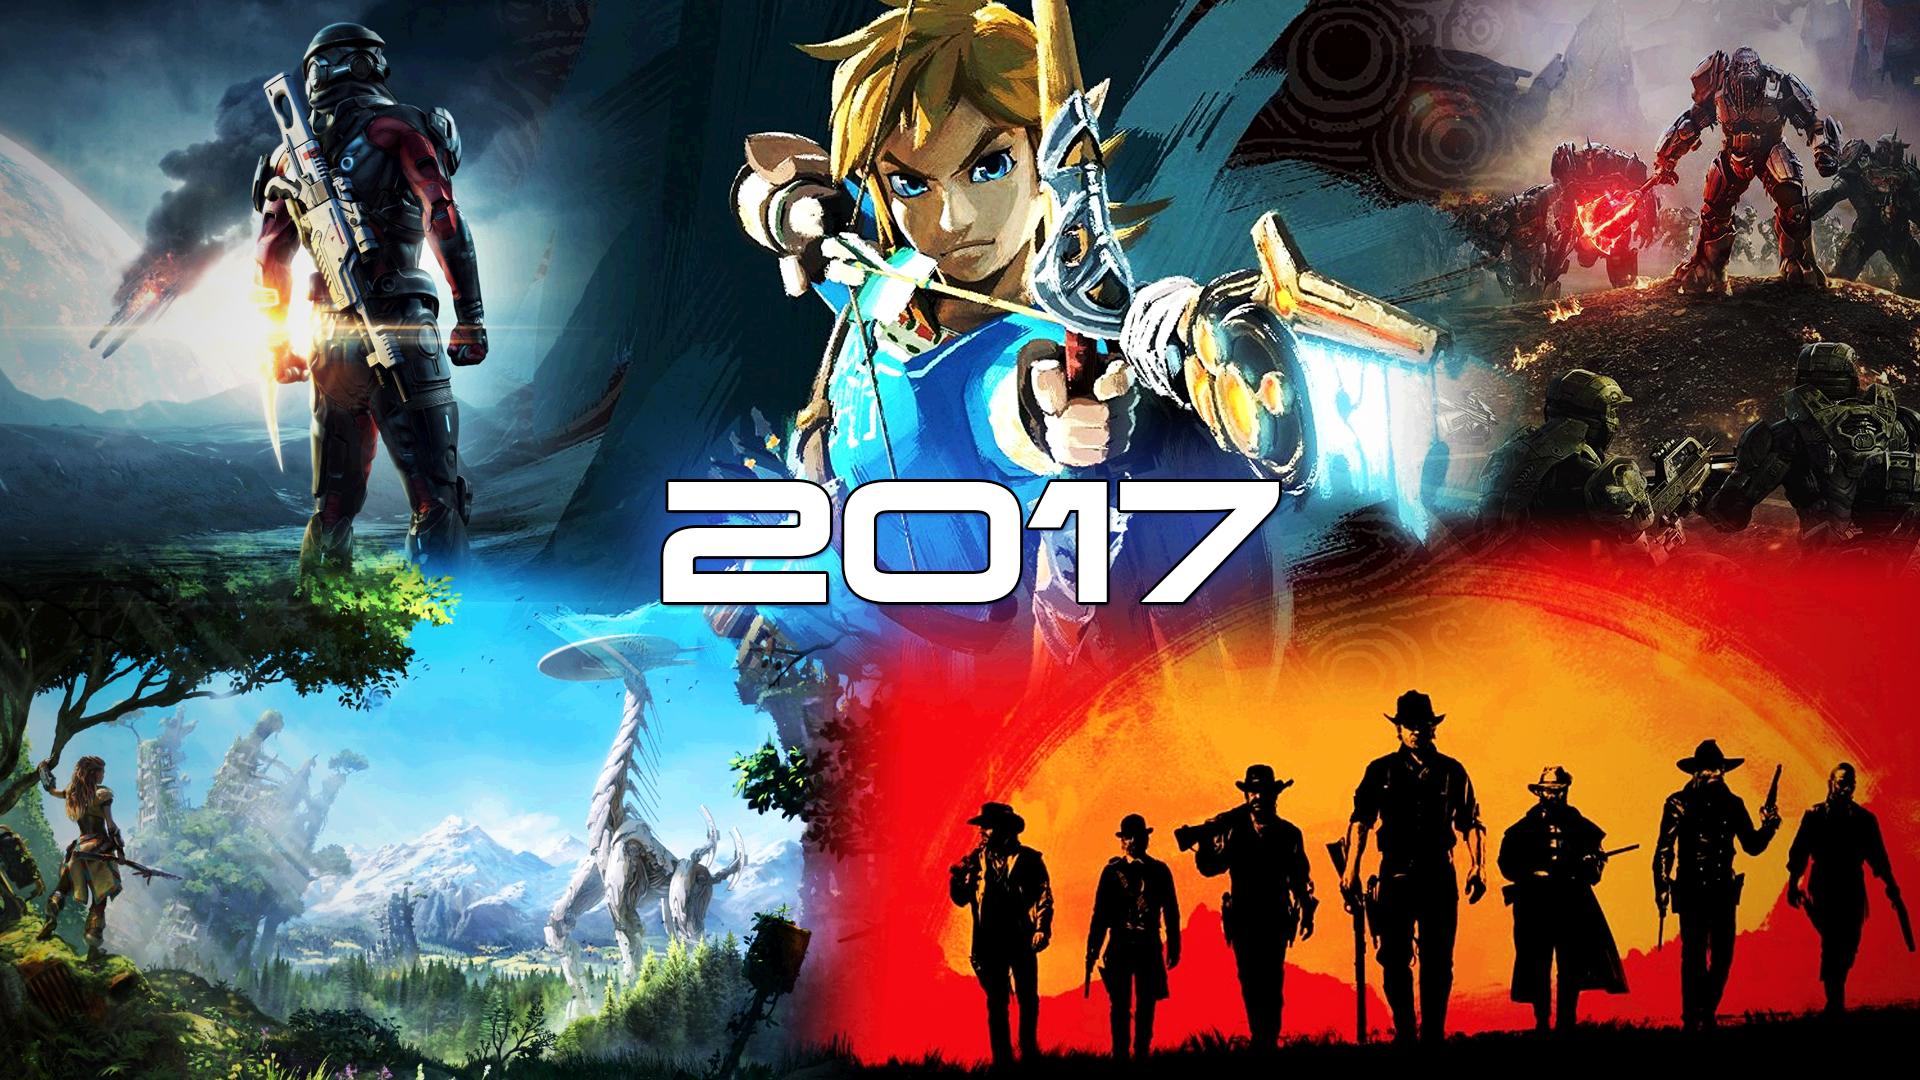 2017 Video Game Collage By Archangel470 On Deviantart